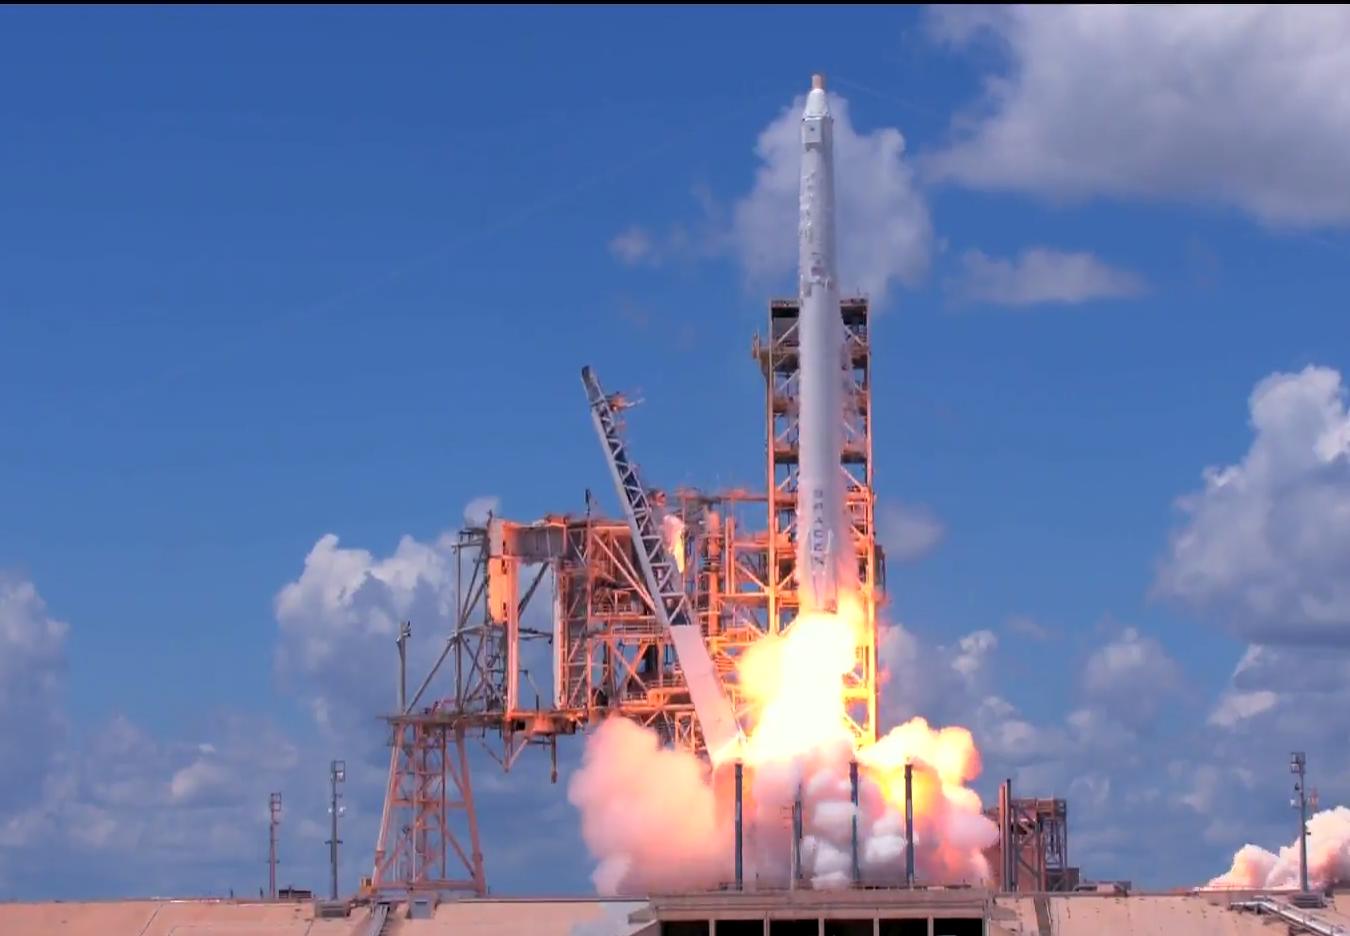 CRS-13 liftoff